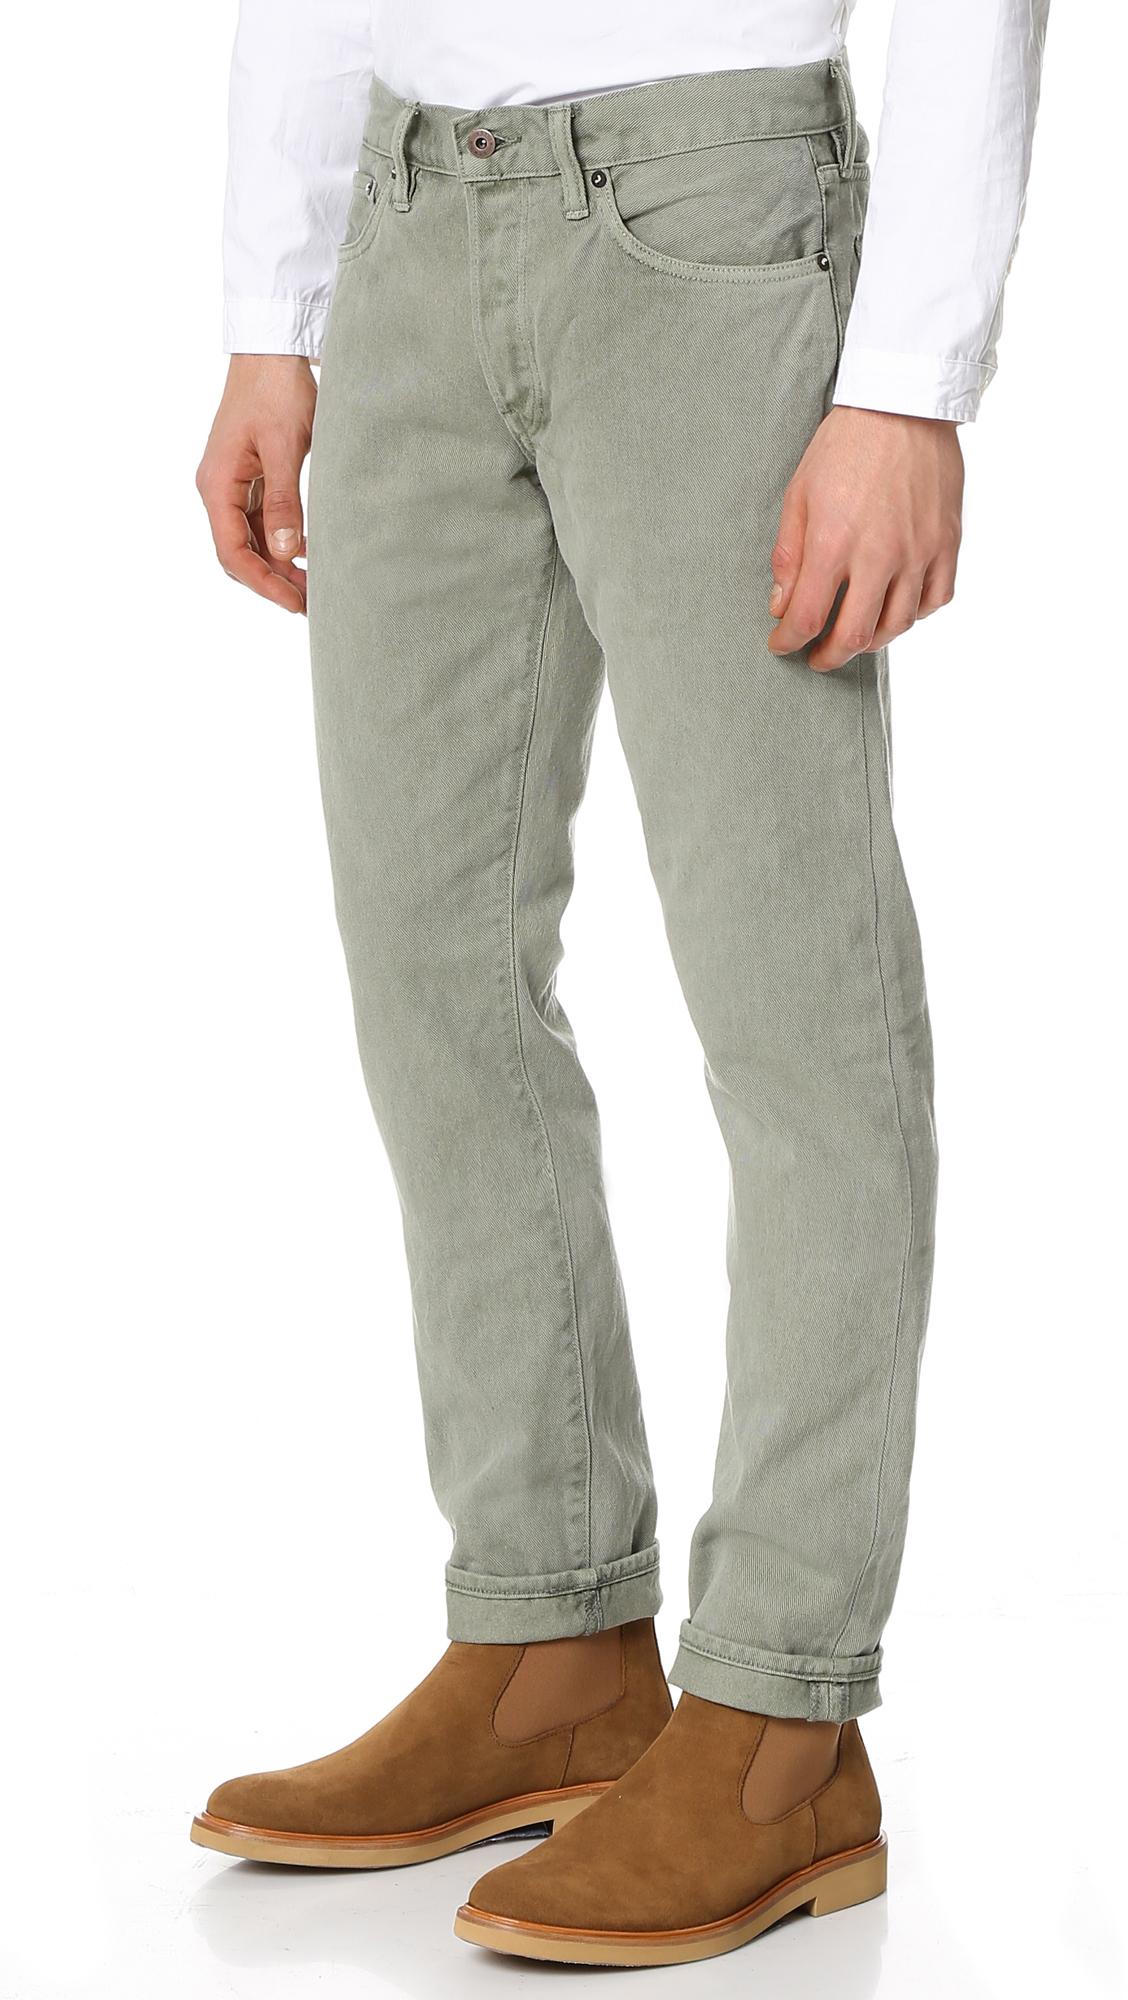 Simon Miller Denim M002 Cadiz Narrow Jeans in Grey for Men